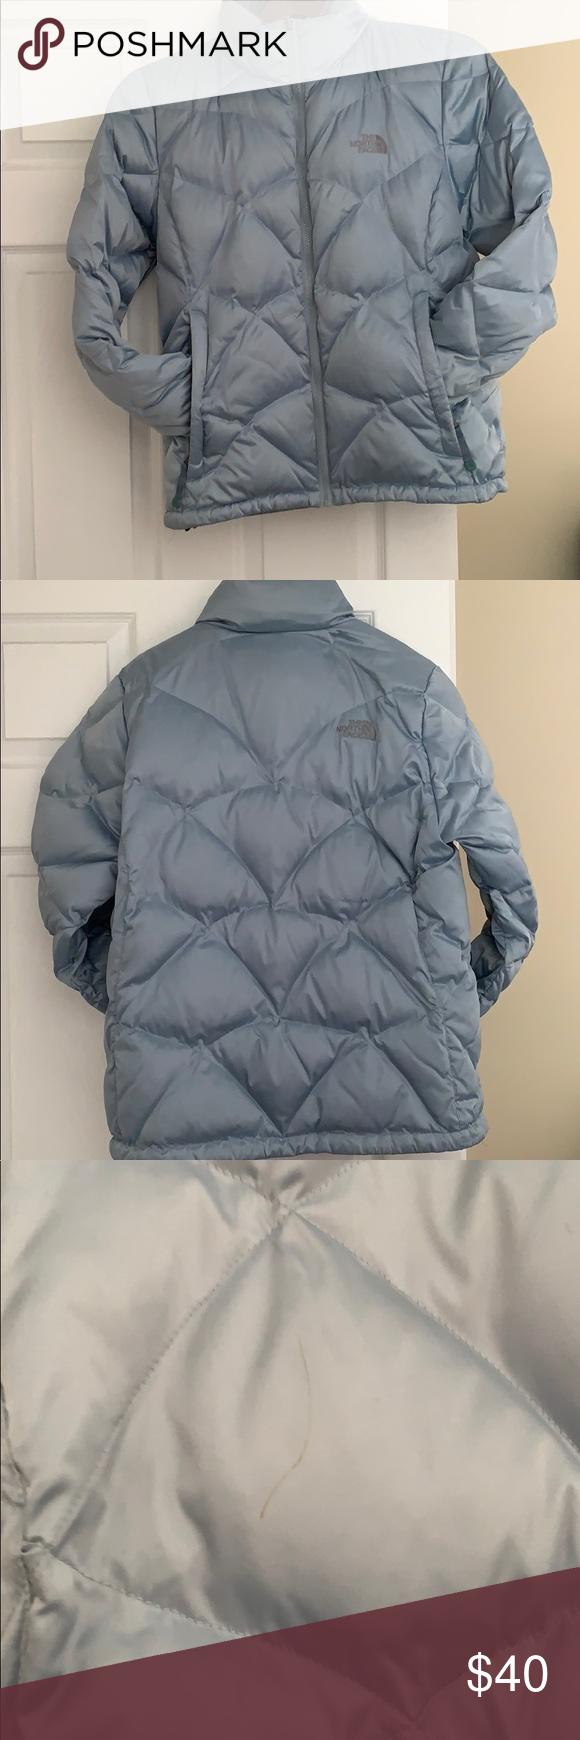 Women S North Face Winter Puffer Jacket Winter Puffer Jackets Baby Blue Colour Jackets [ 1740 x 580 Pixel ]